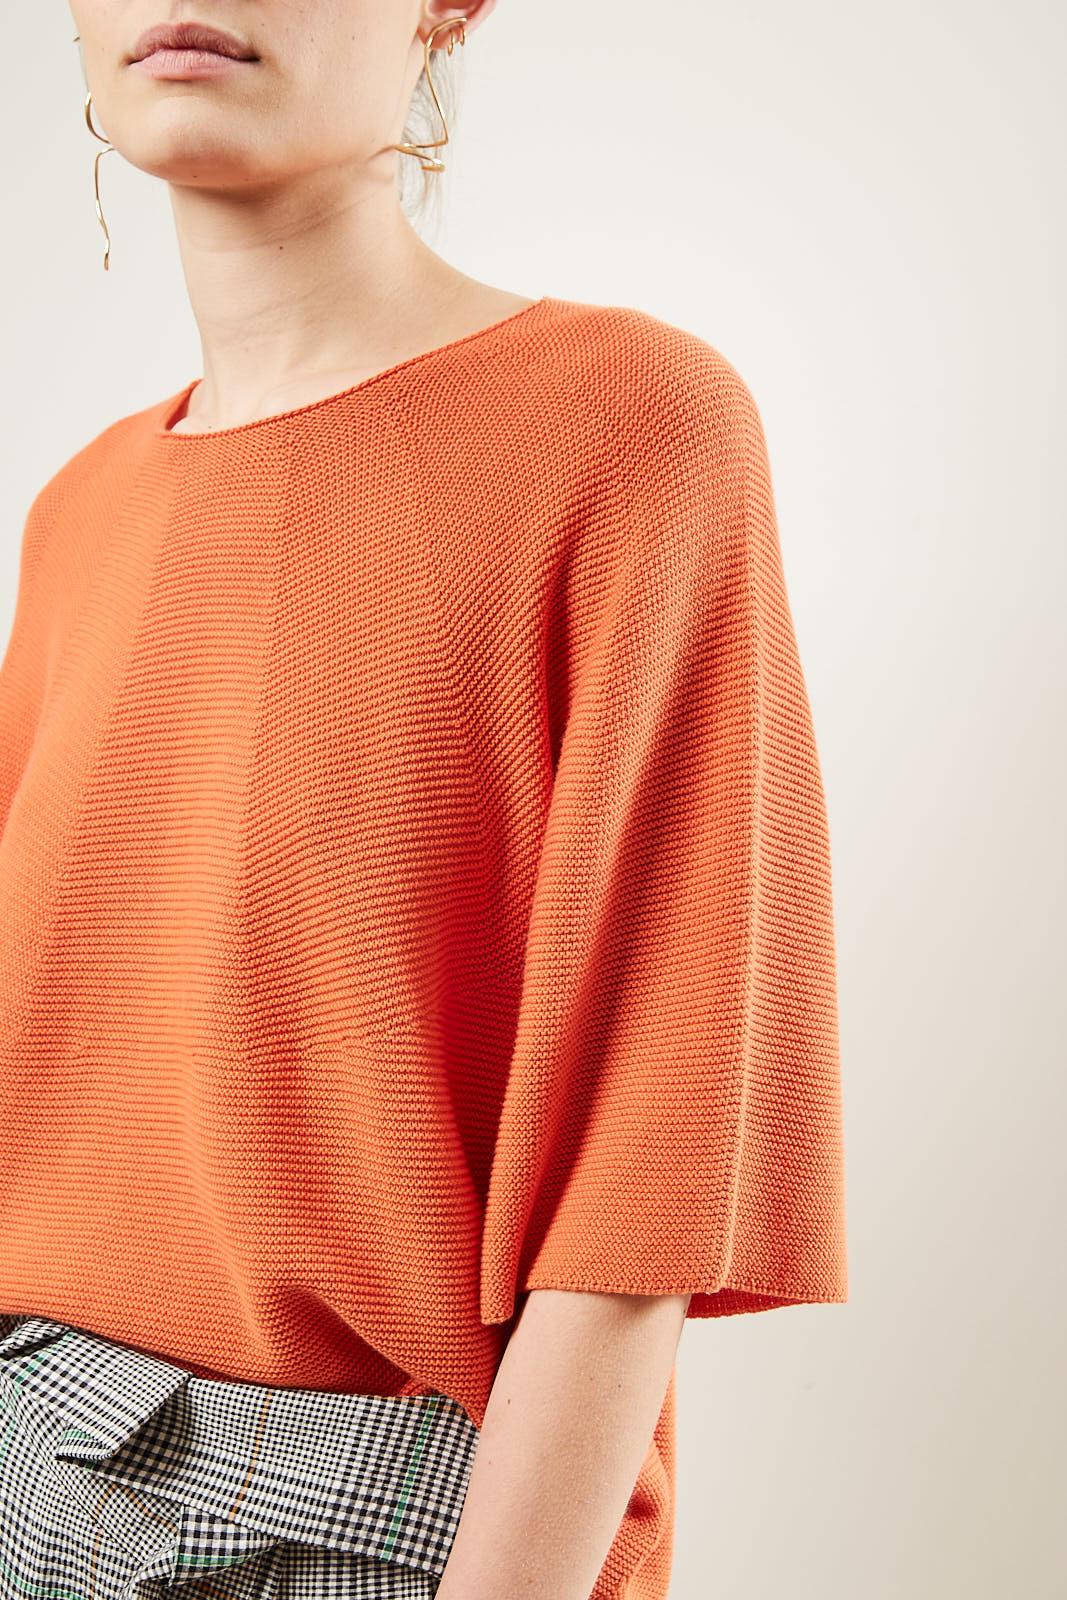 Christian Wijnants - Koda knitted top.